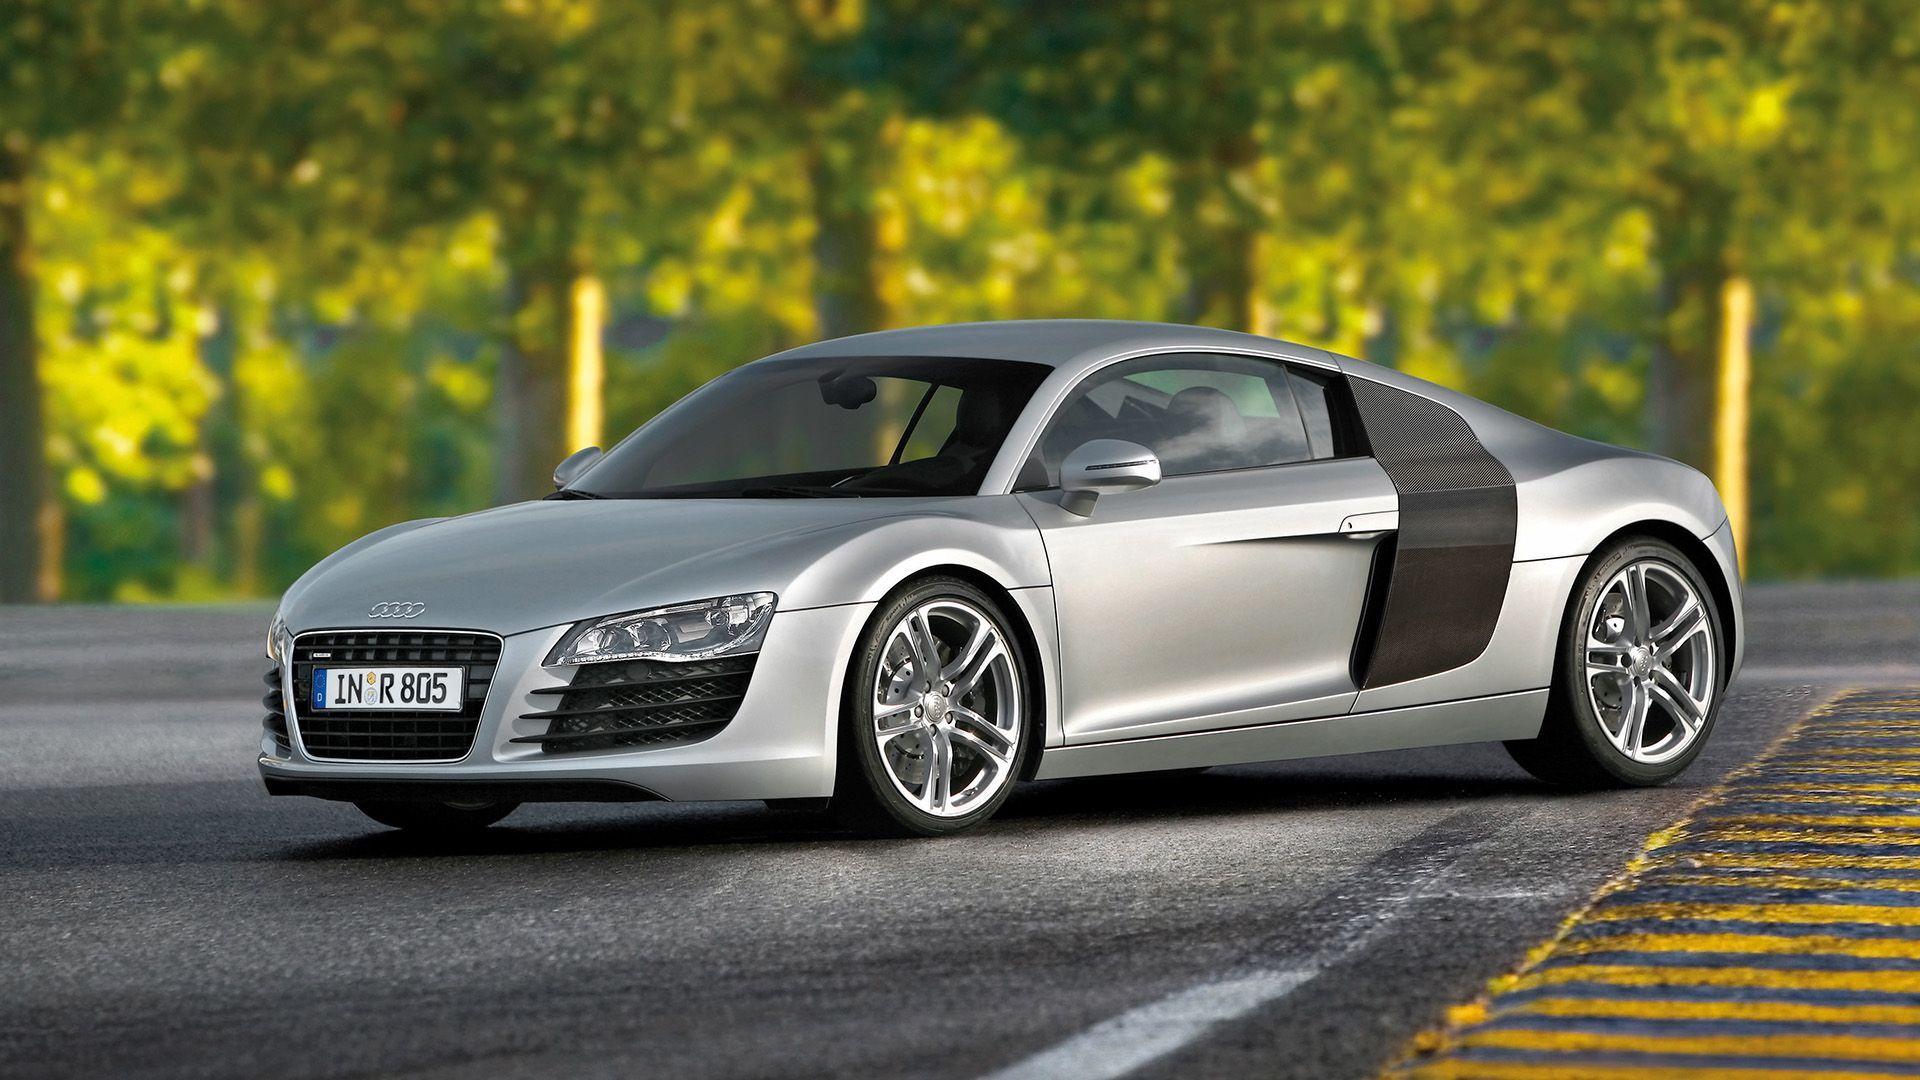 full hd wallpapers 1080p cars free download   pixelstalk